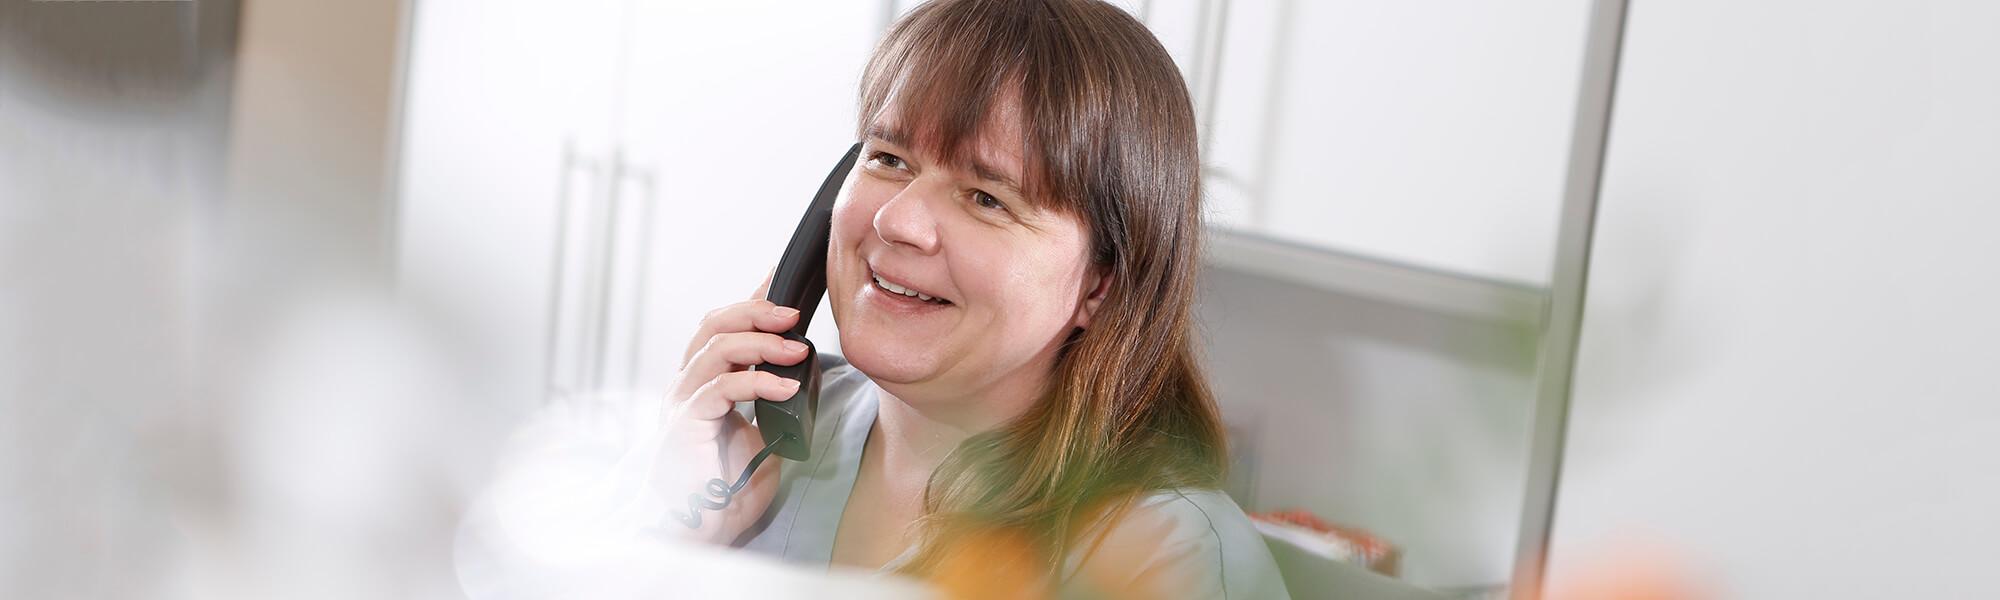 Hausarzt Lage - Dr. Burghardt - Kontakt